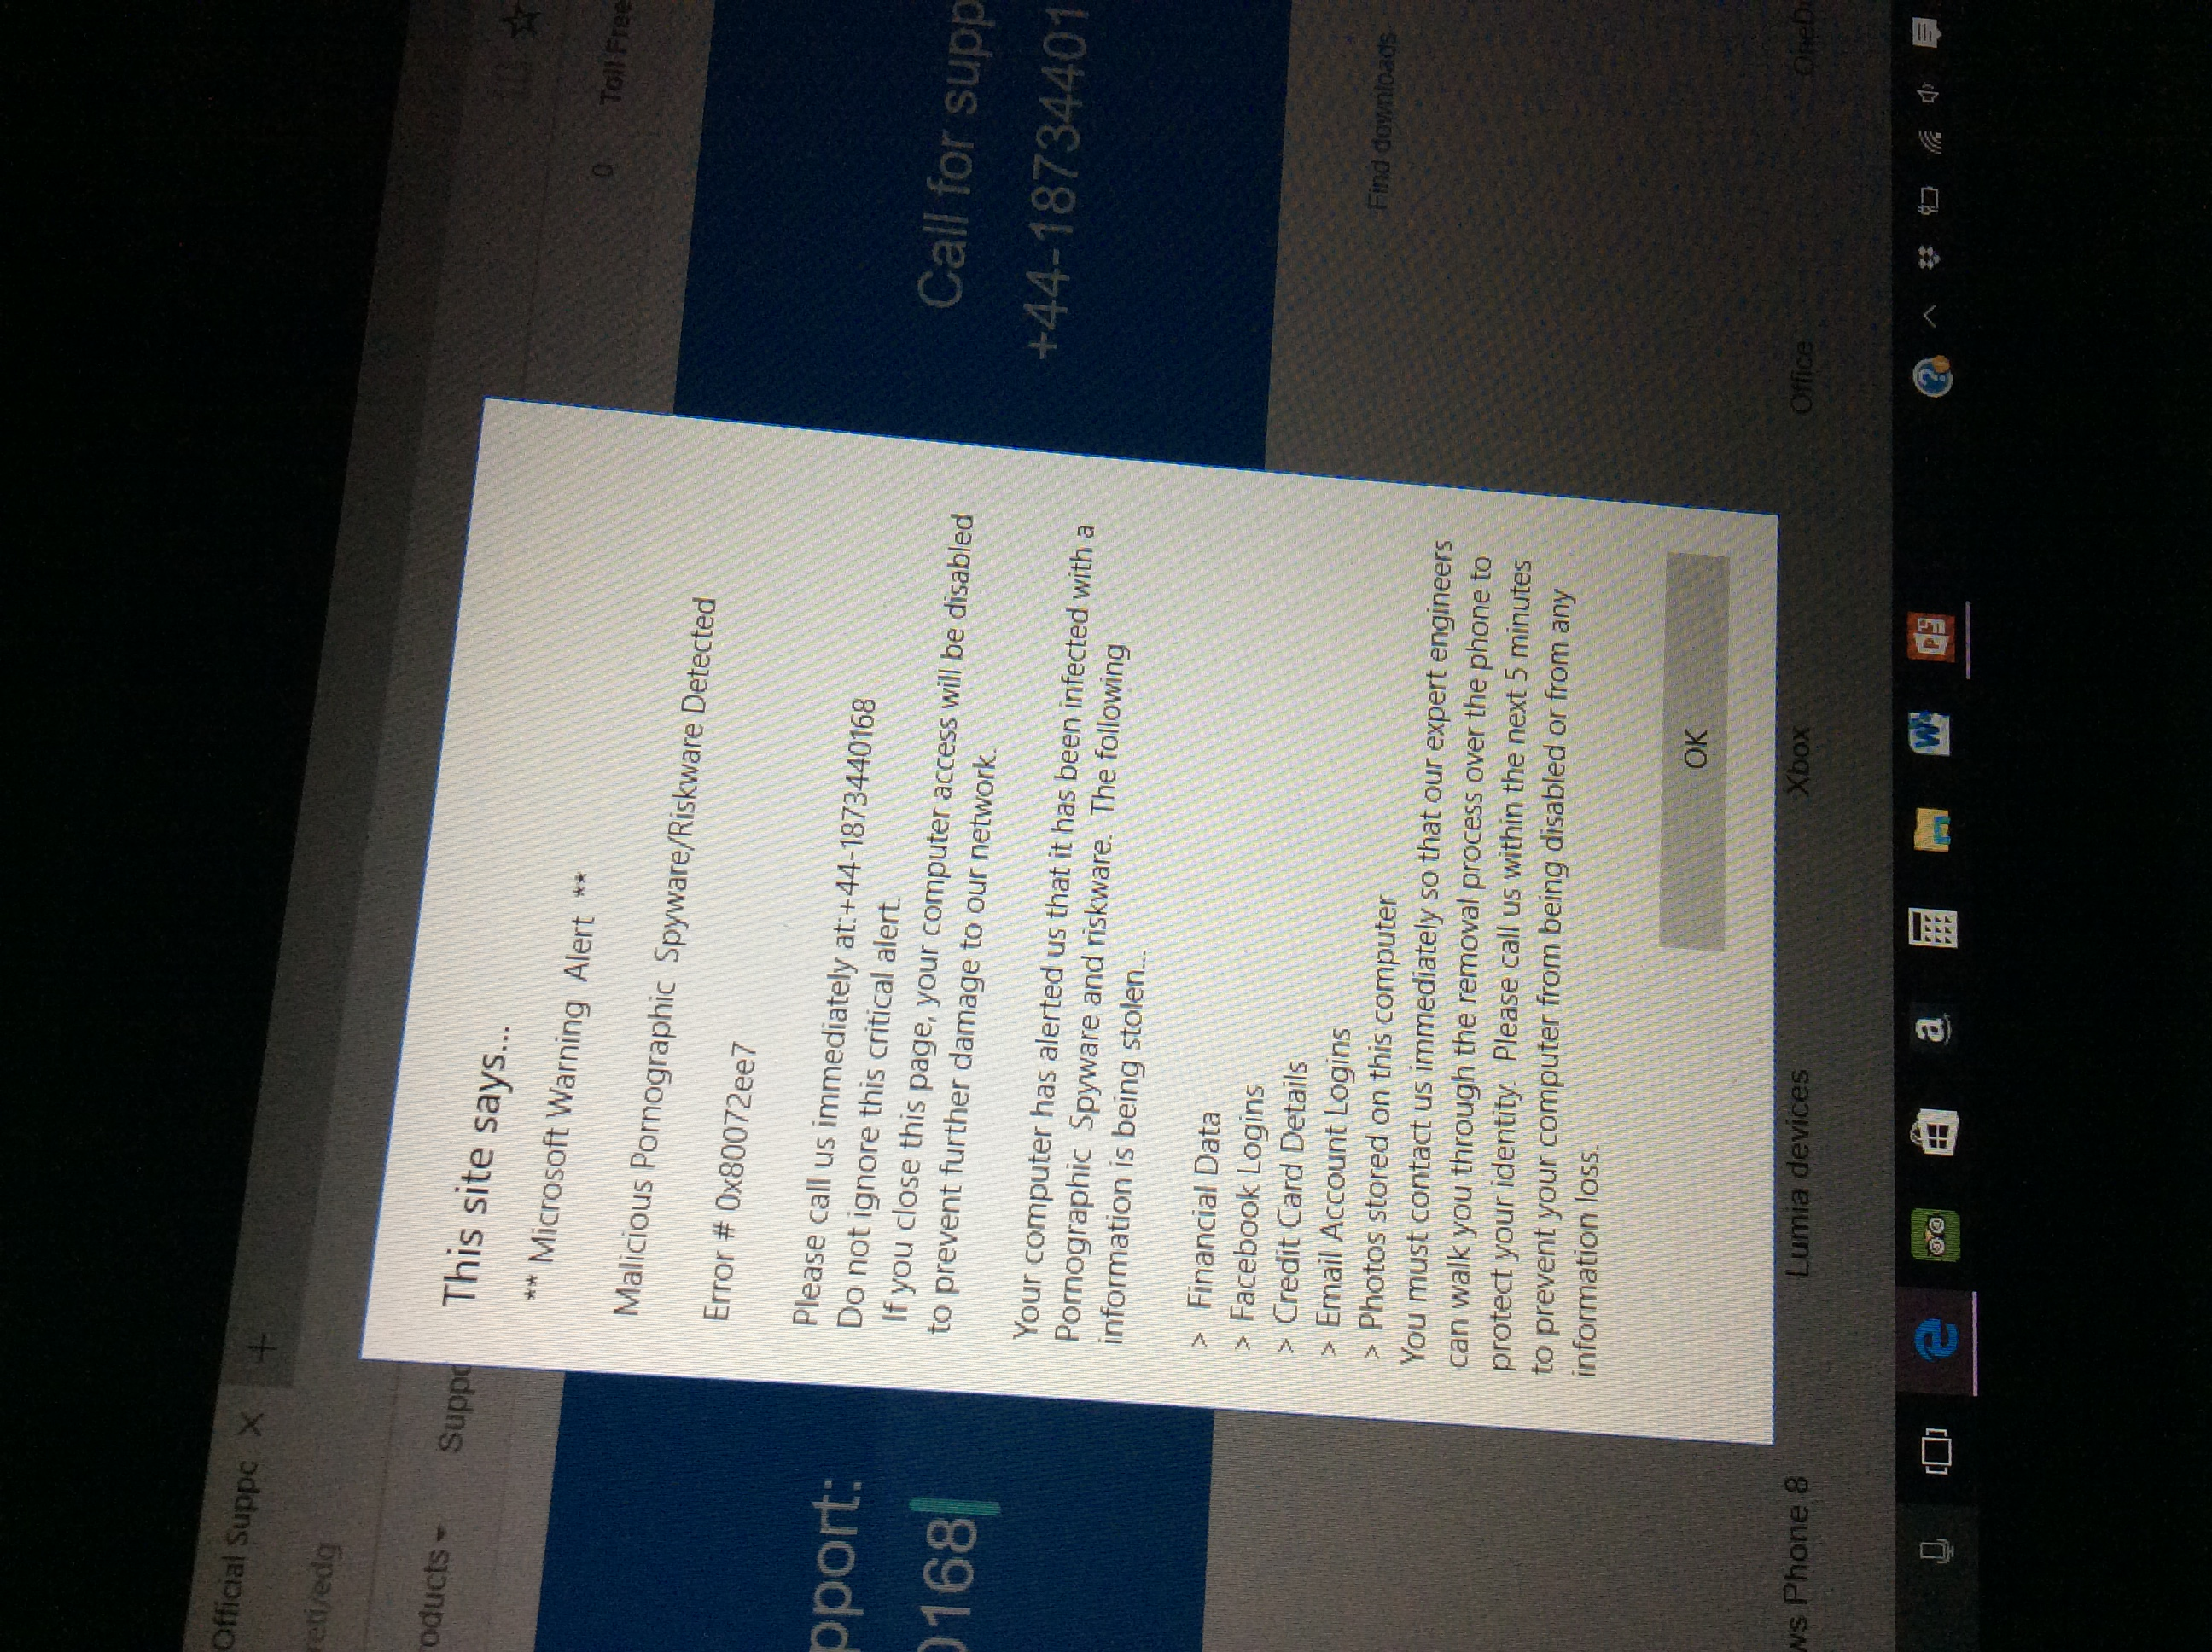 Microsoft warning alert - Microsoft Community